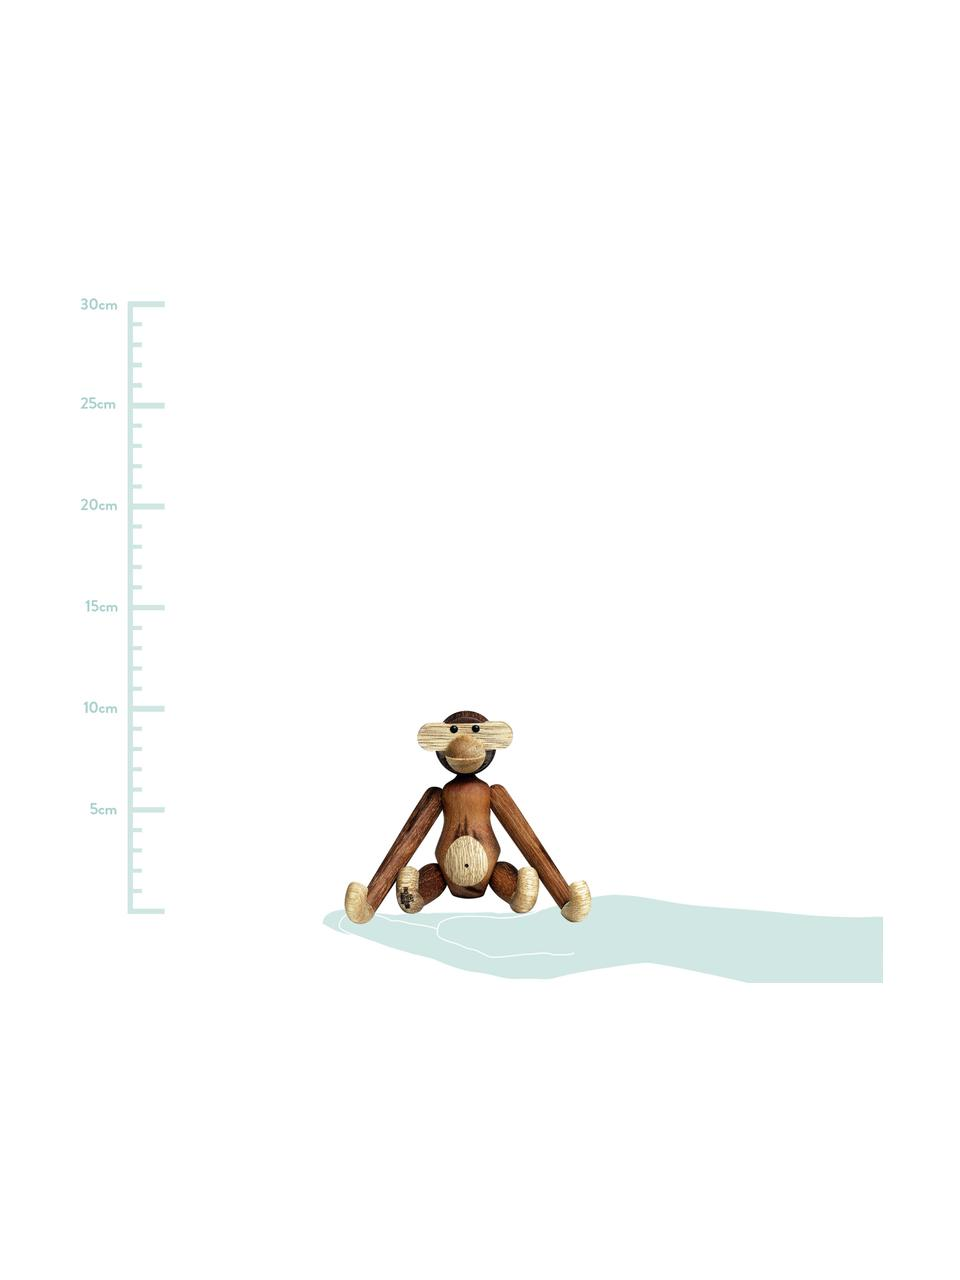 Designer-Deko-Objekt Monkey, Teakholz, Teakholz, Limbaholz, lackiert, Teakholz, Limbaholz, 20 x 19 cm